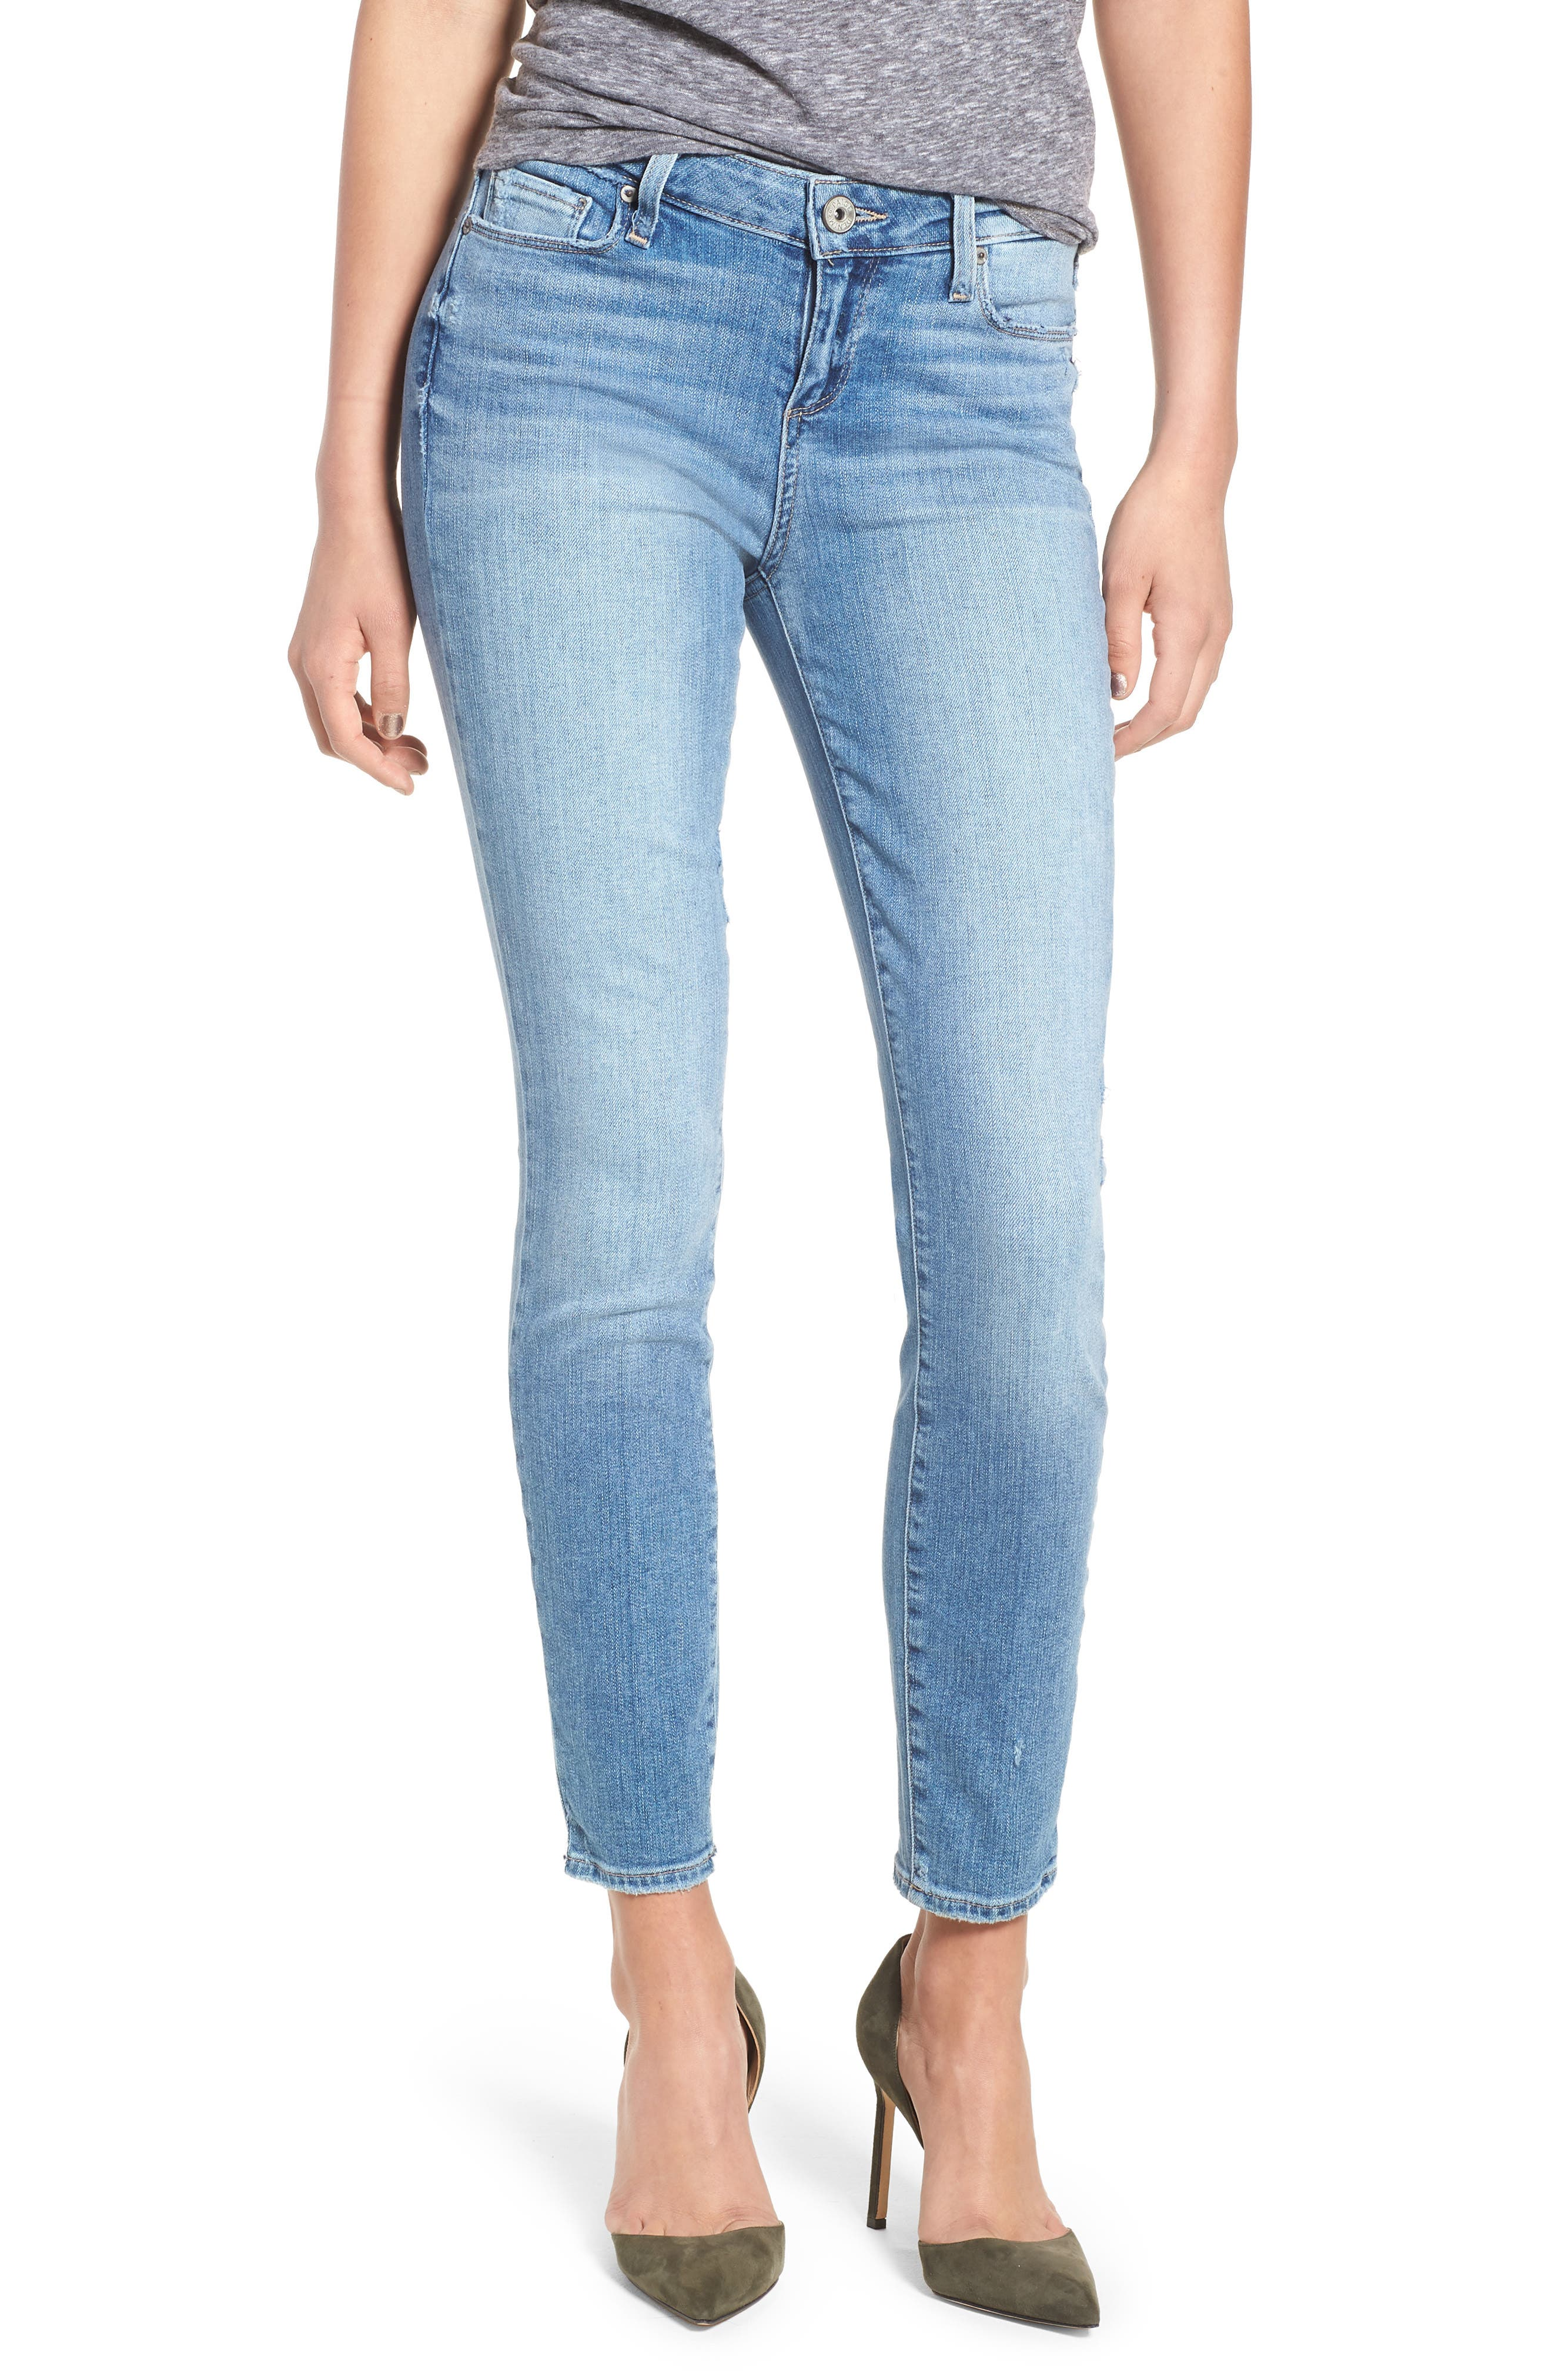 Transcend - Verdugo Ankle Ultra Skinny Jeans,                         Main,                         color, 400